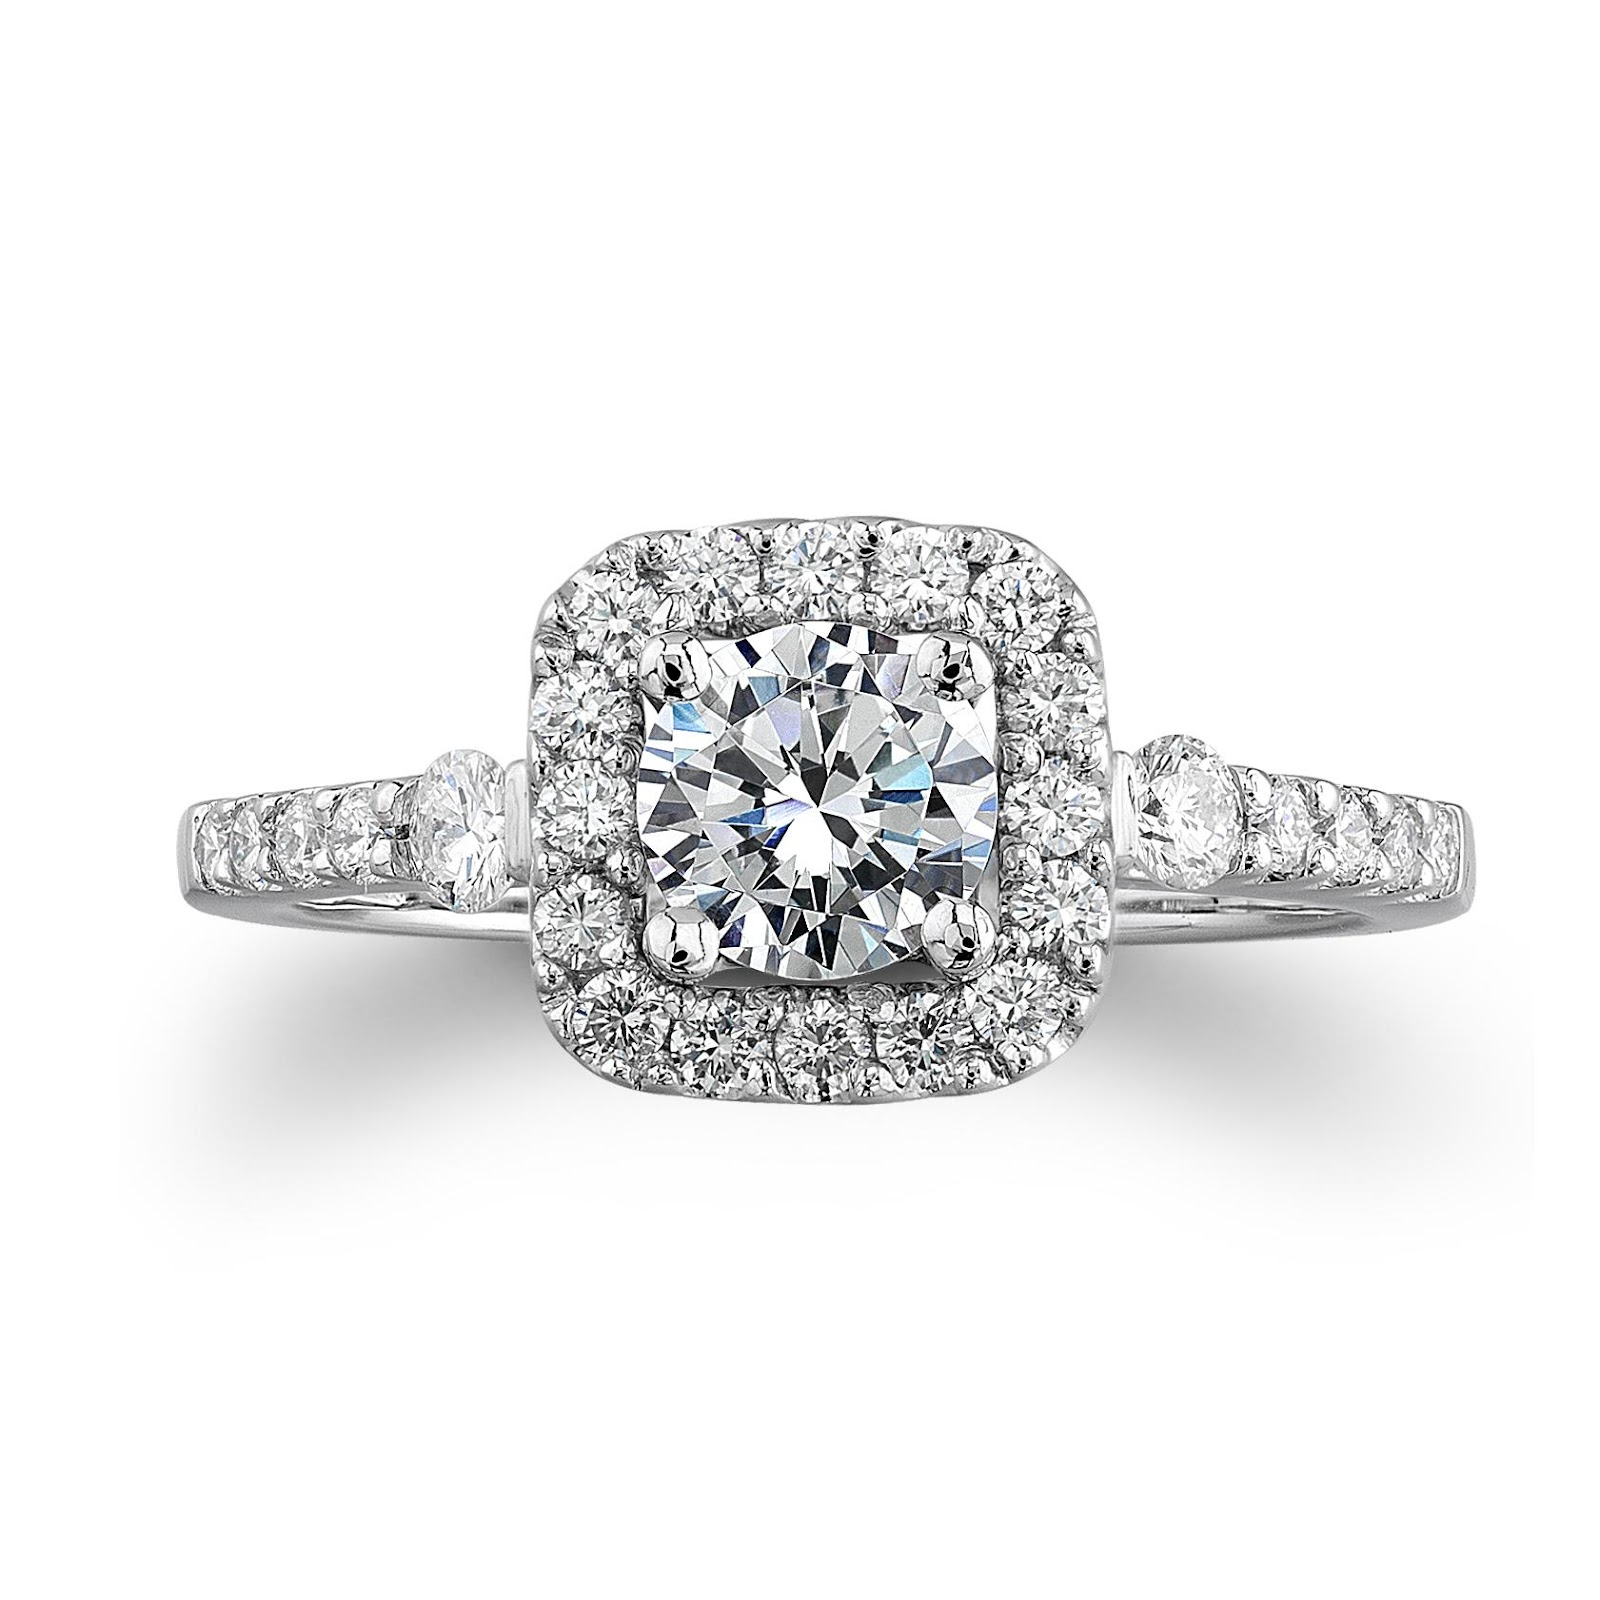 Engagement Ring Carat Weight: